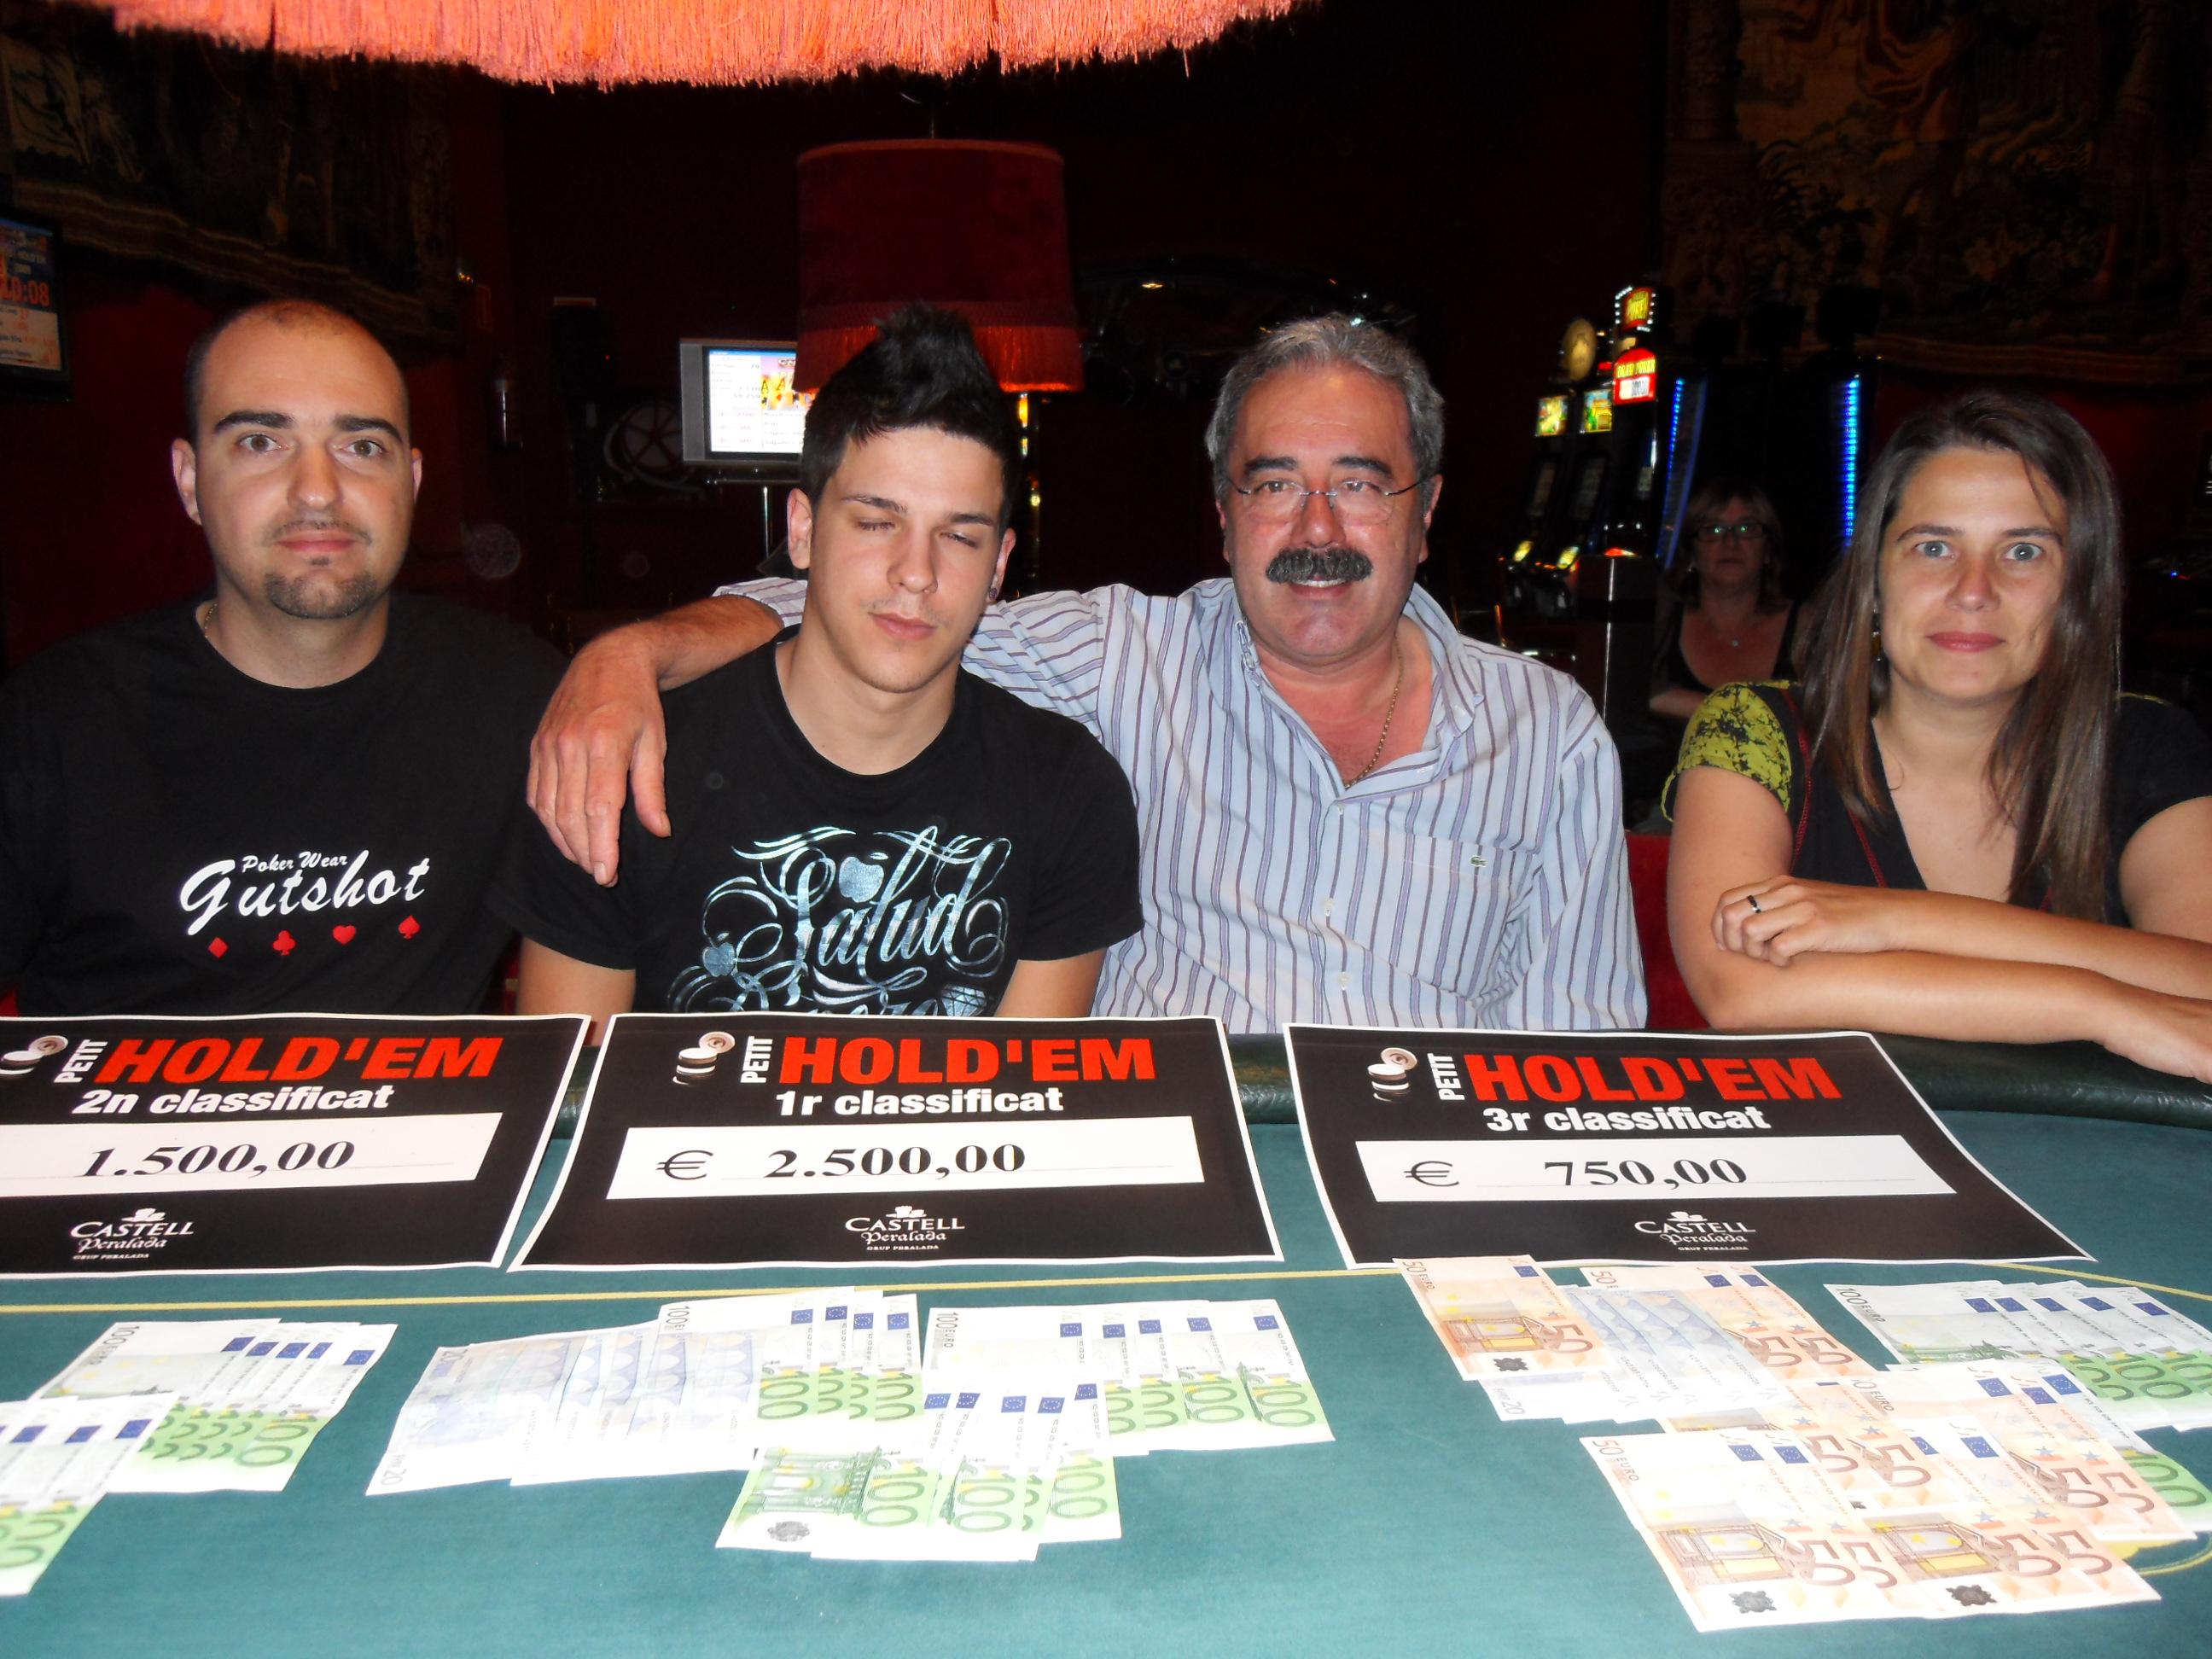 La promoción semanal casino lotohome castellon-254140